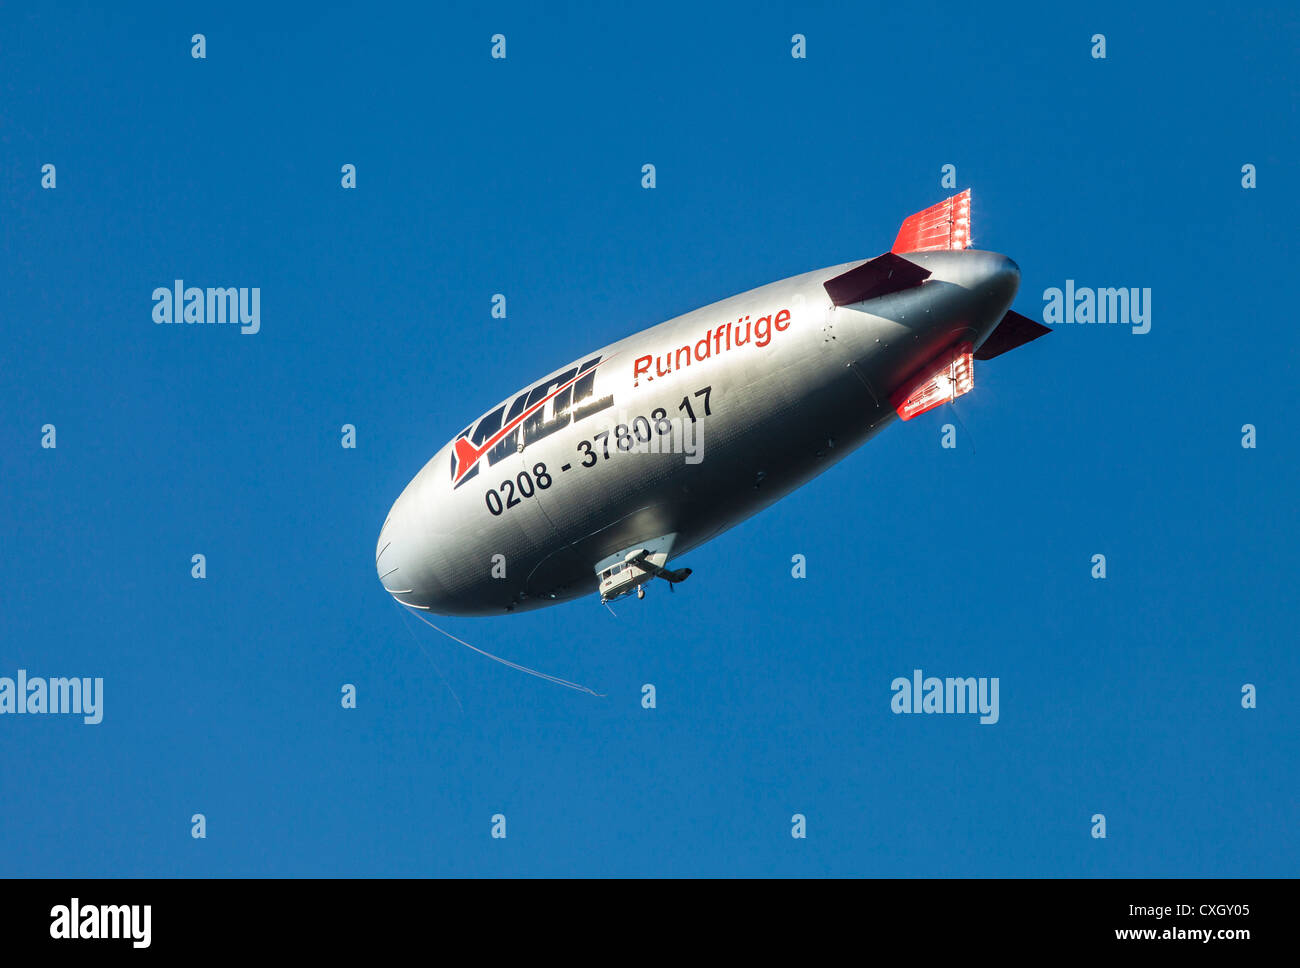 Blimp, airship, Germany - Stock Image